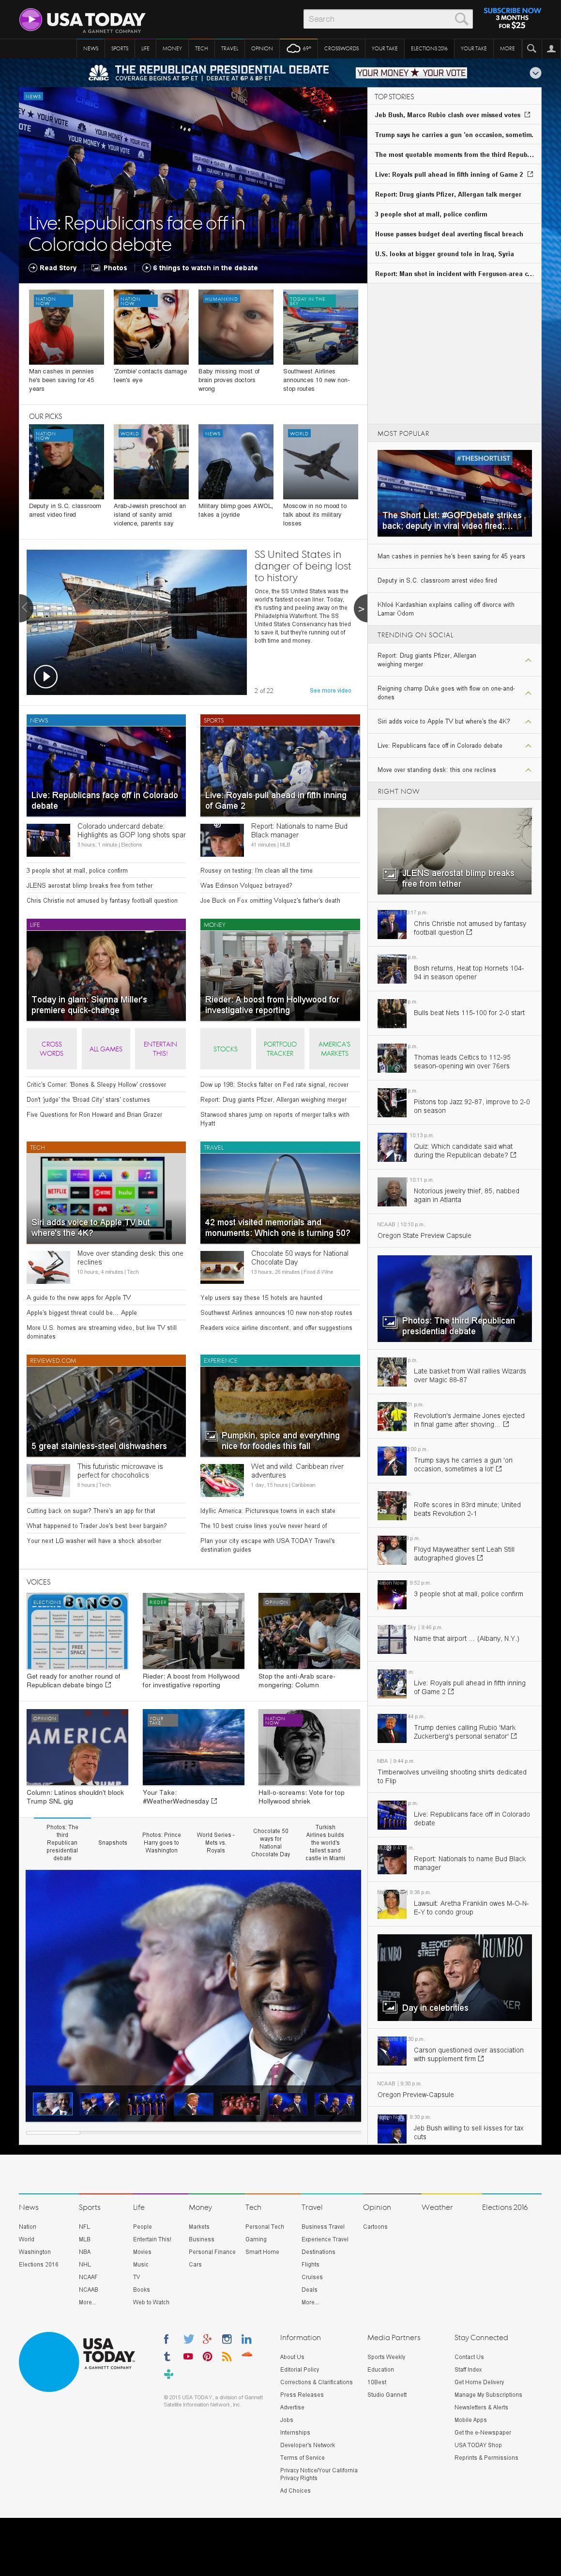 USA Today at Thursday Oct. 29, 2015, 2:24 a.m. UTC